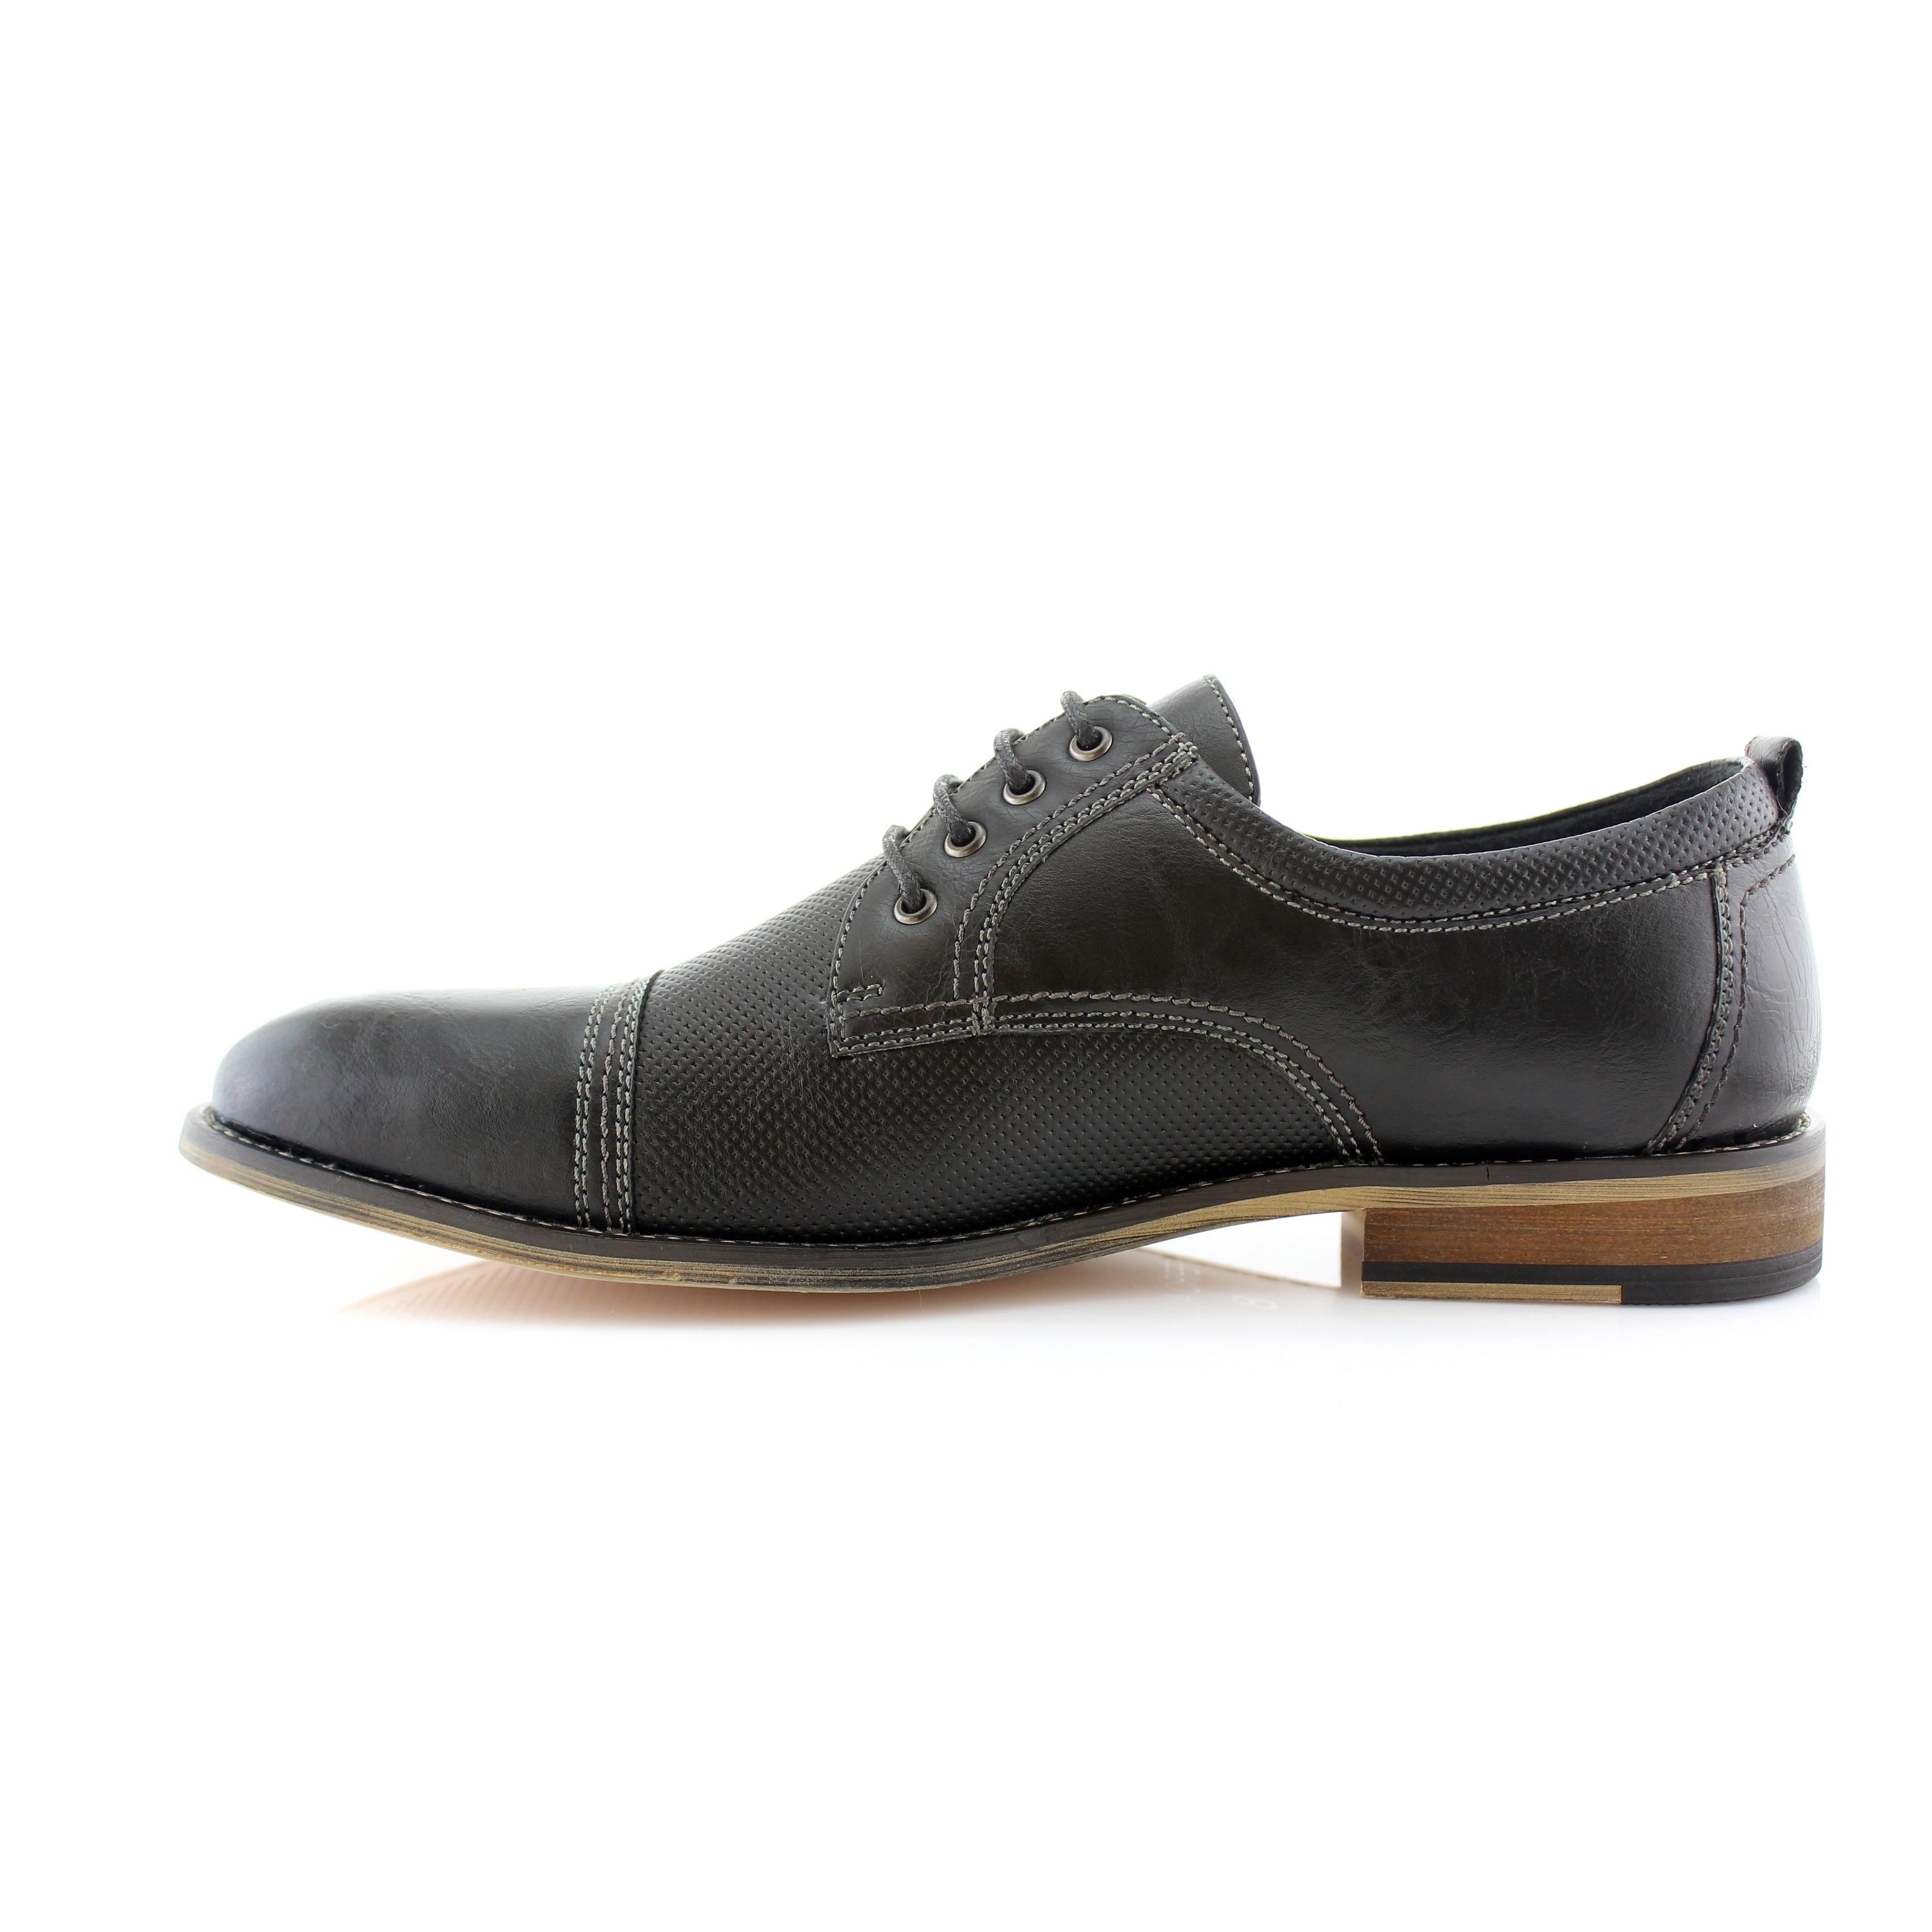 Ferro-Aldo-Felix-MFA19605L-Men-039-s-Dress-Shoes-For-Work-or thumbnail 9